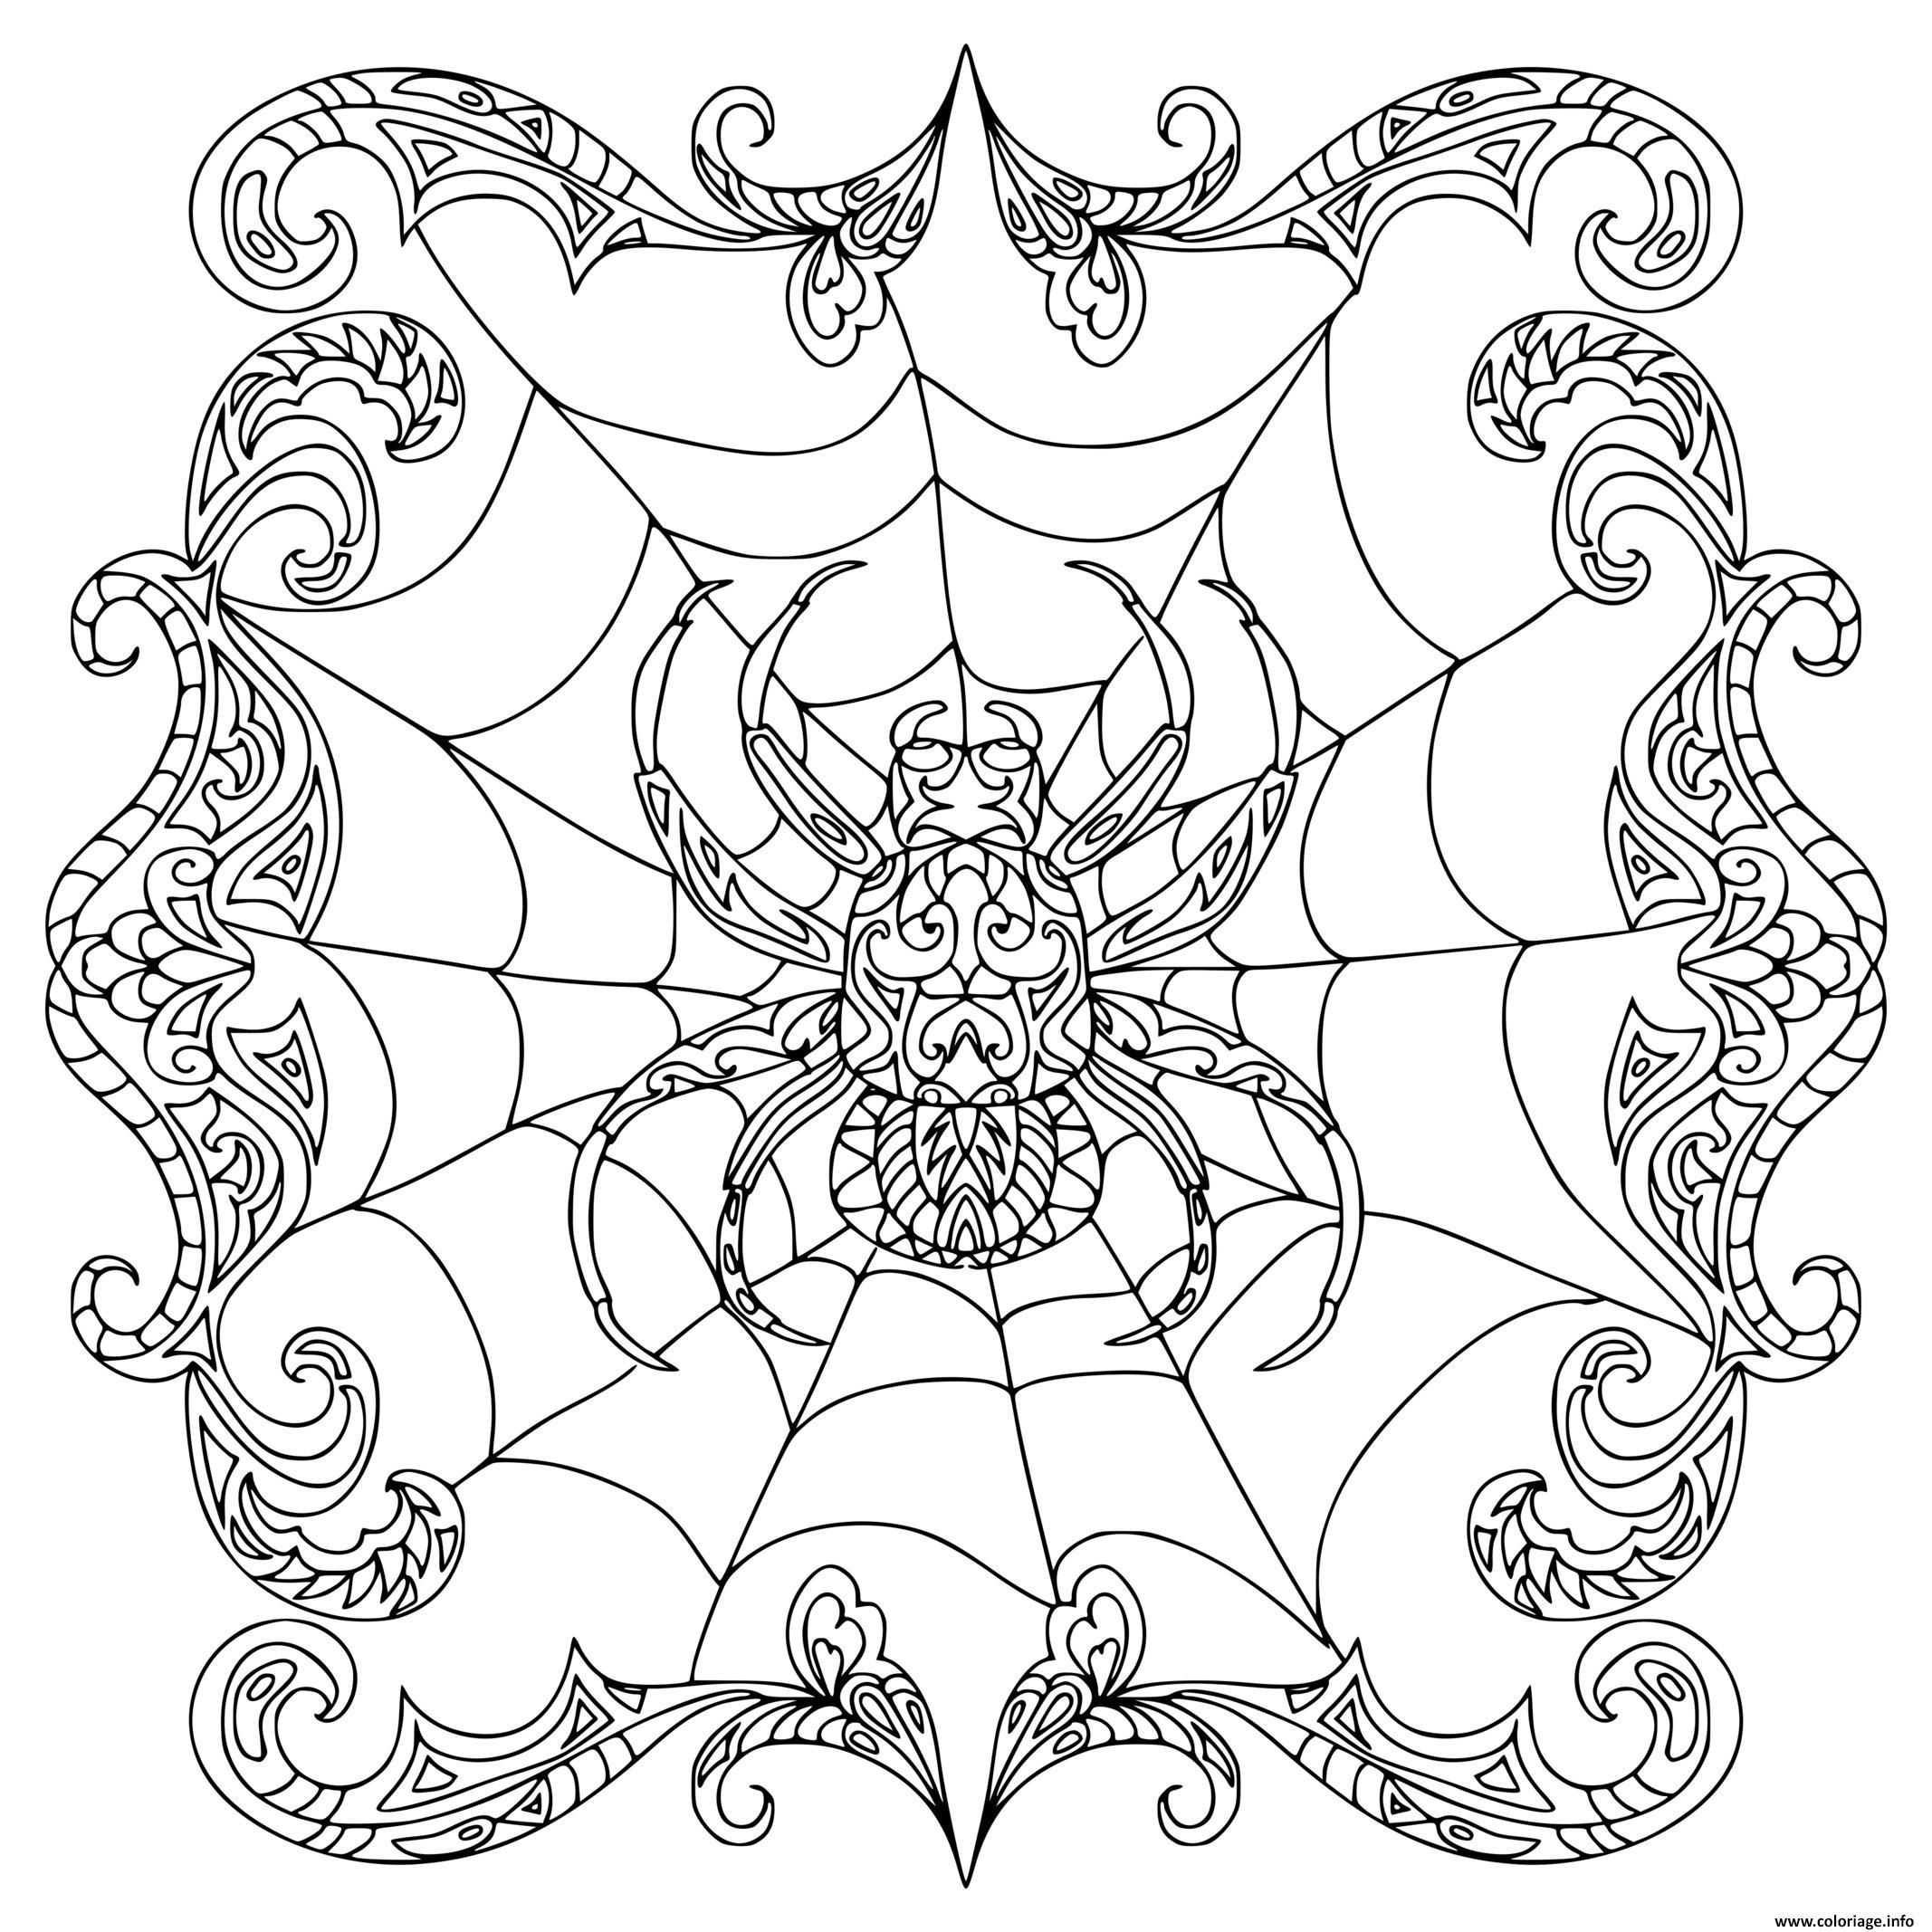 Dessin spider zentangle araignee Coloriage Gratuit à Imprimer